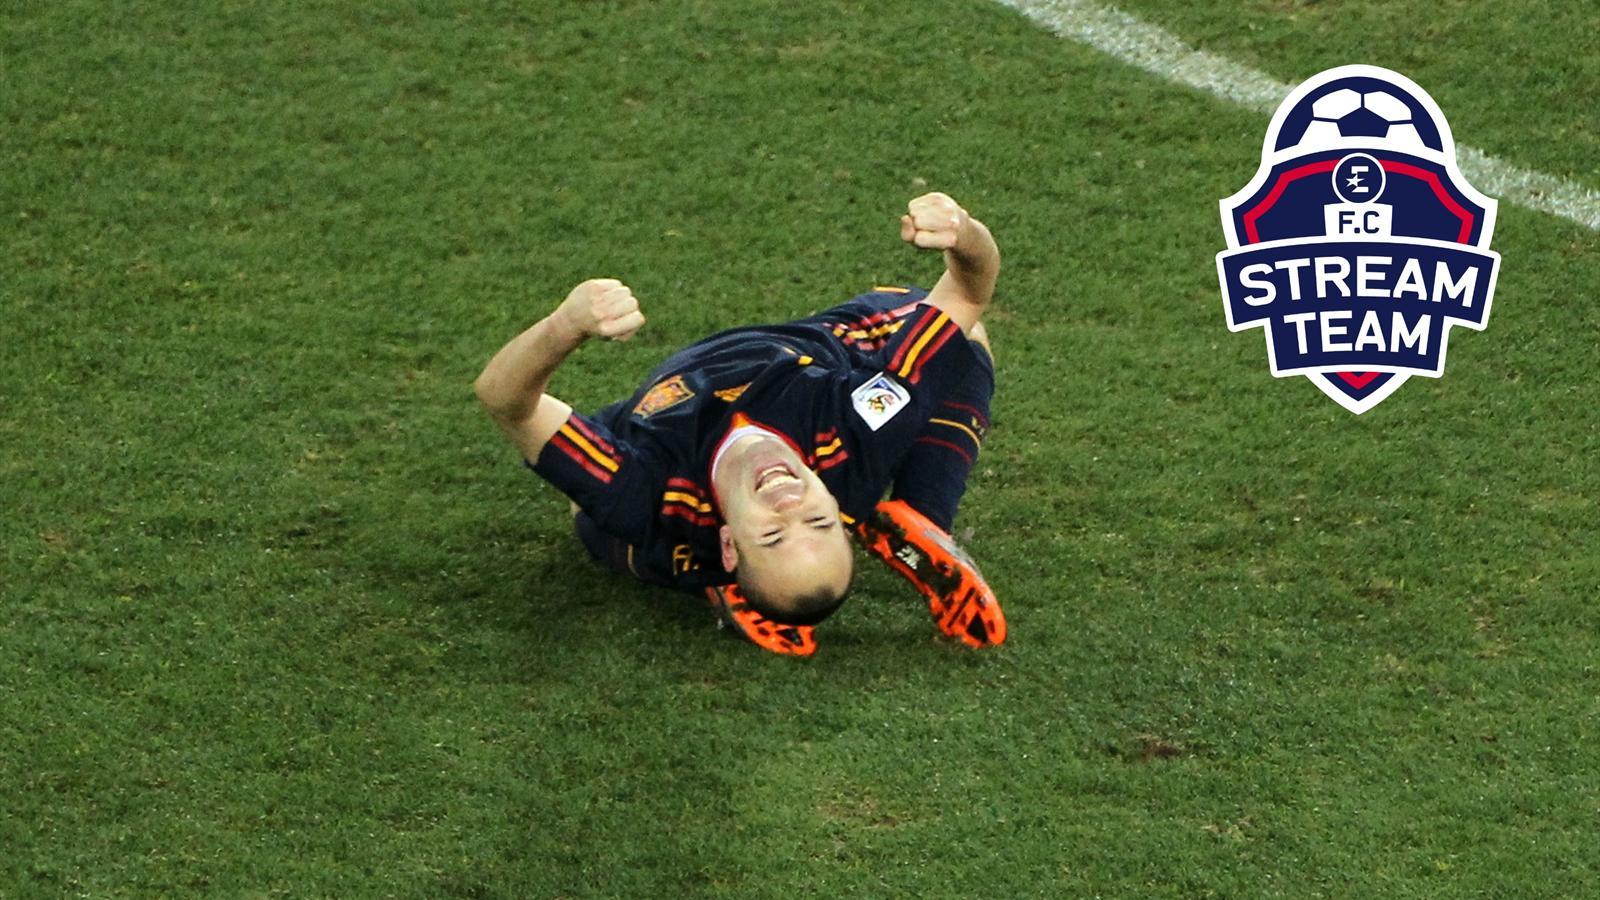 Vid o iniesta est il le meilleur joueur espagnol de l 39 histoire liga video eurosport - Coupe de la liga espagnol ...